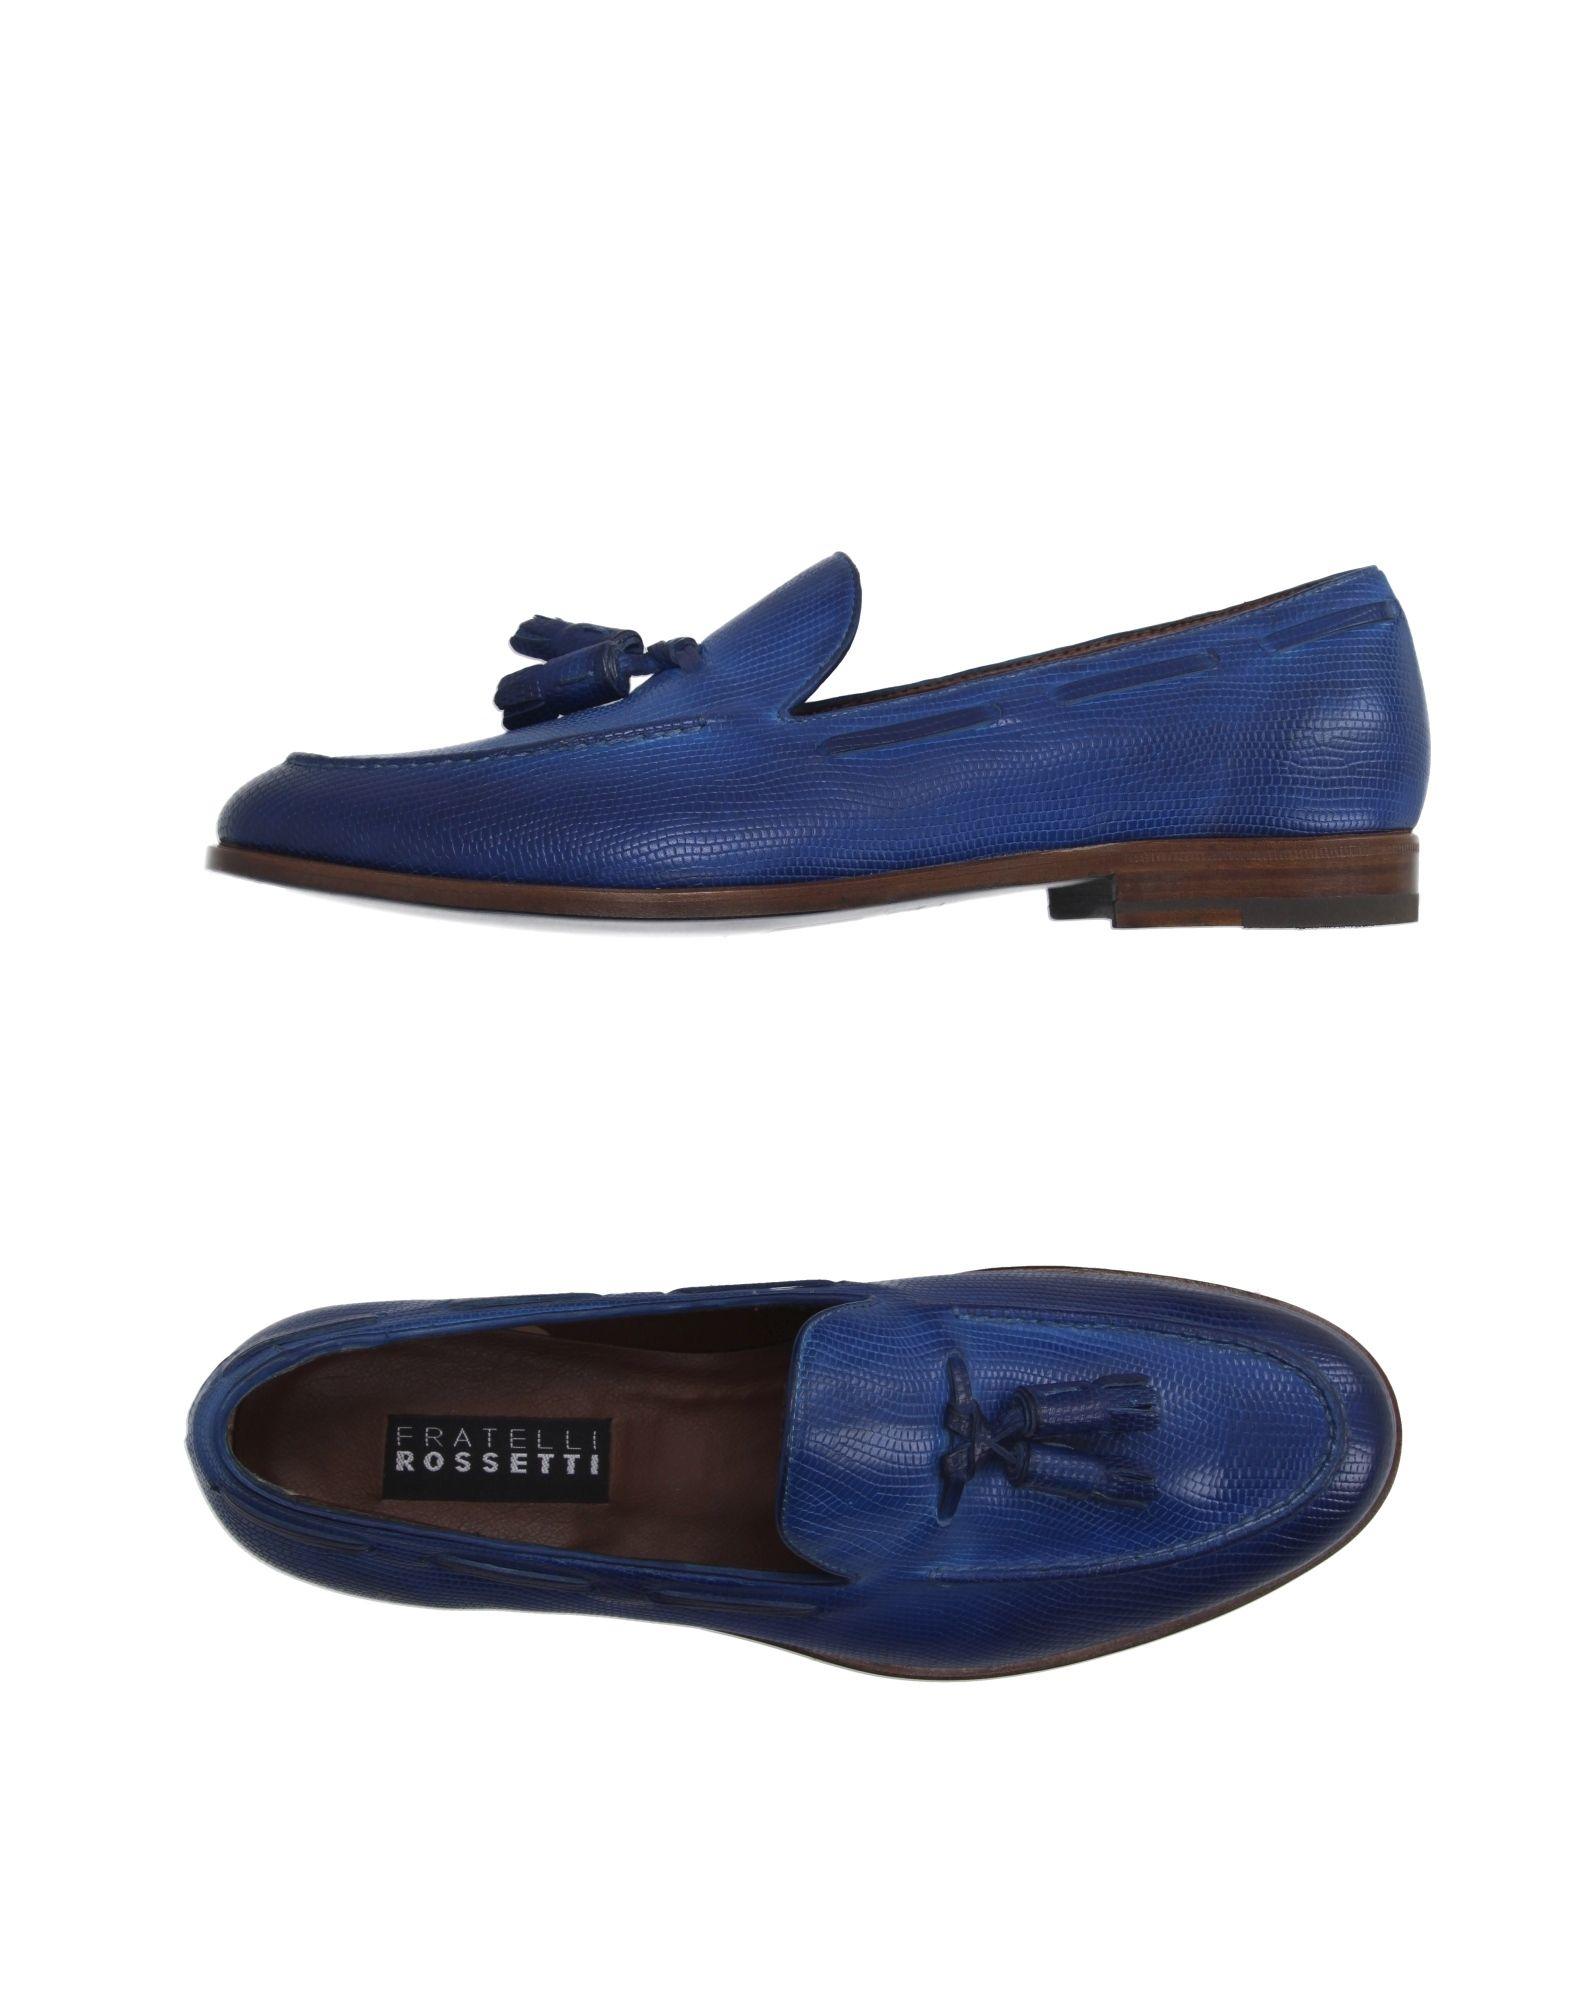 Fratelli Rossetti Shoes New York